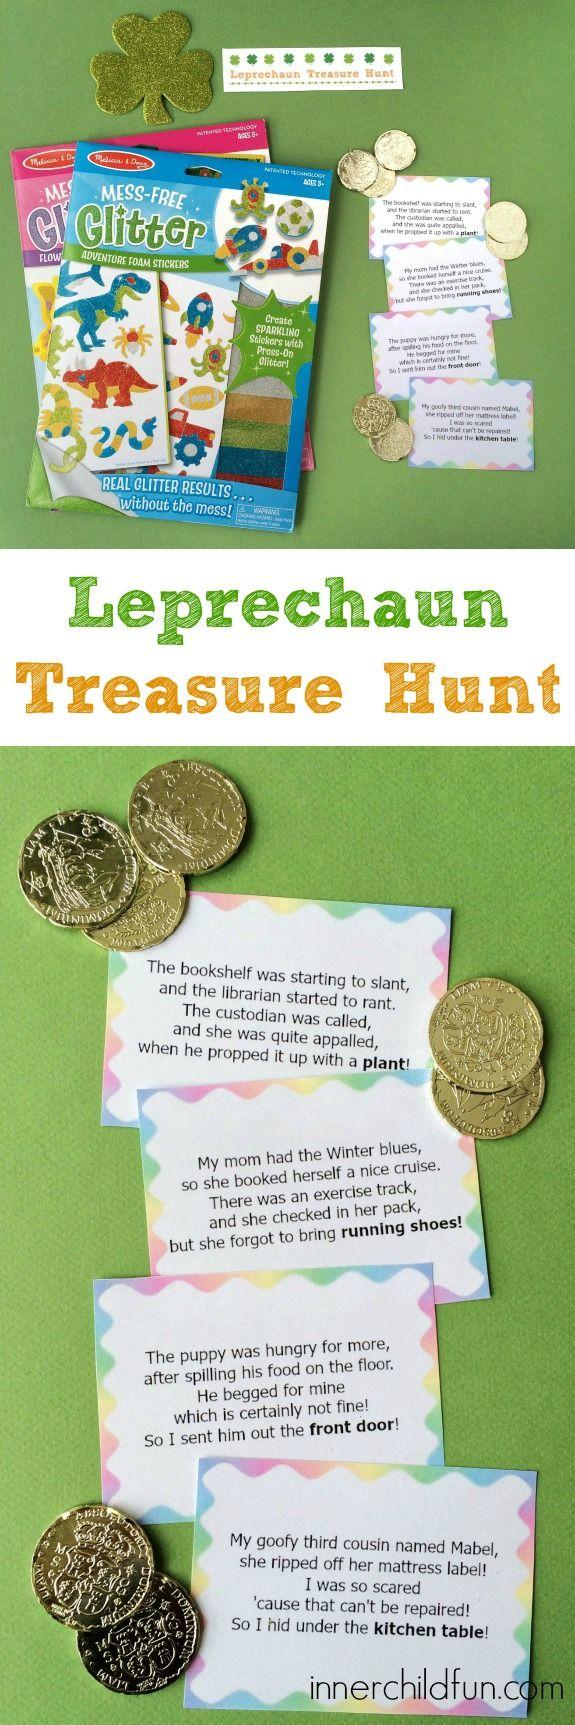 Leprechaun Treasure Hunt Clues -- free printable! #sponsored